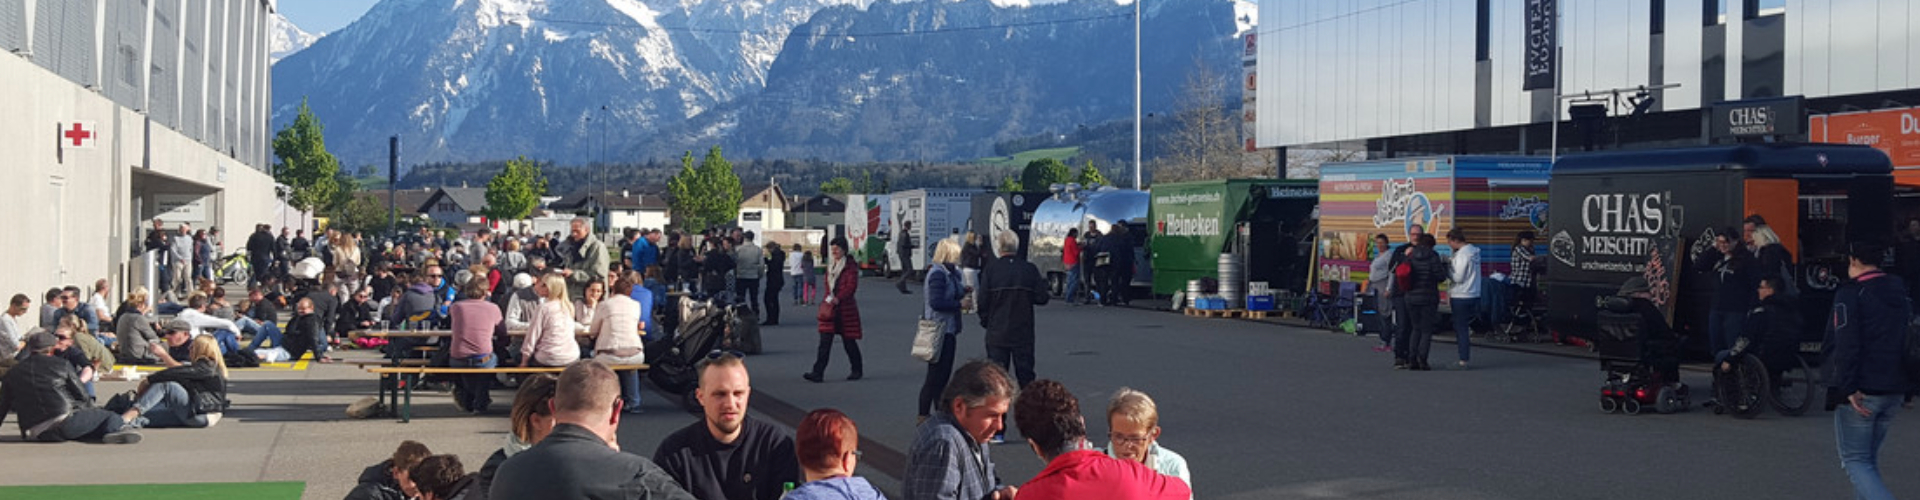 Das Foodtruck Happening in Thun im Frühling